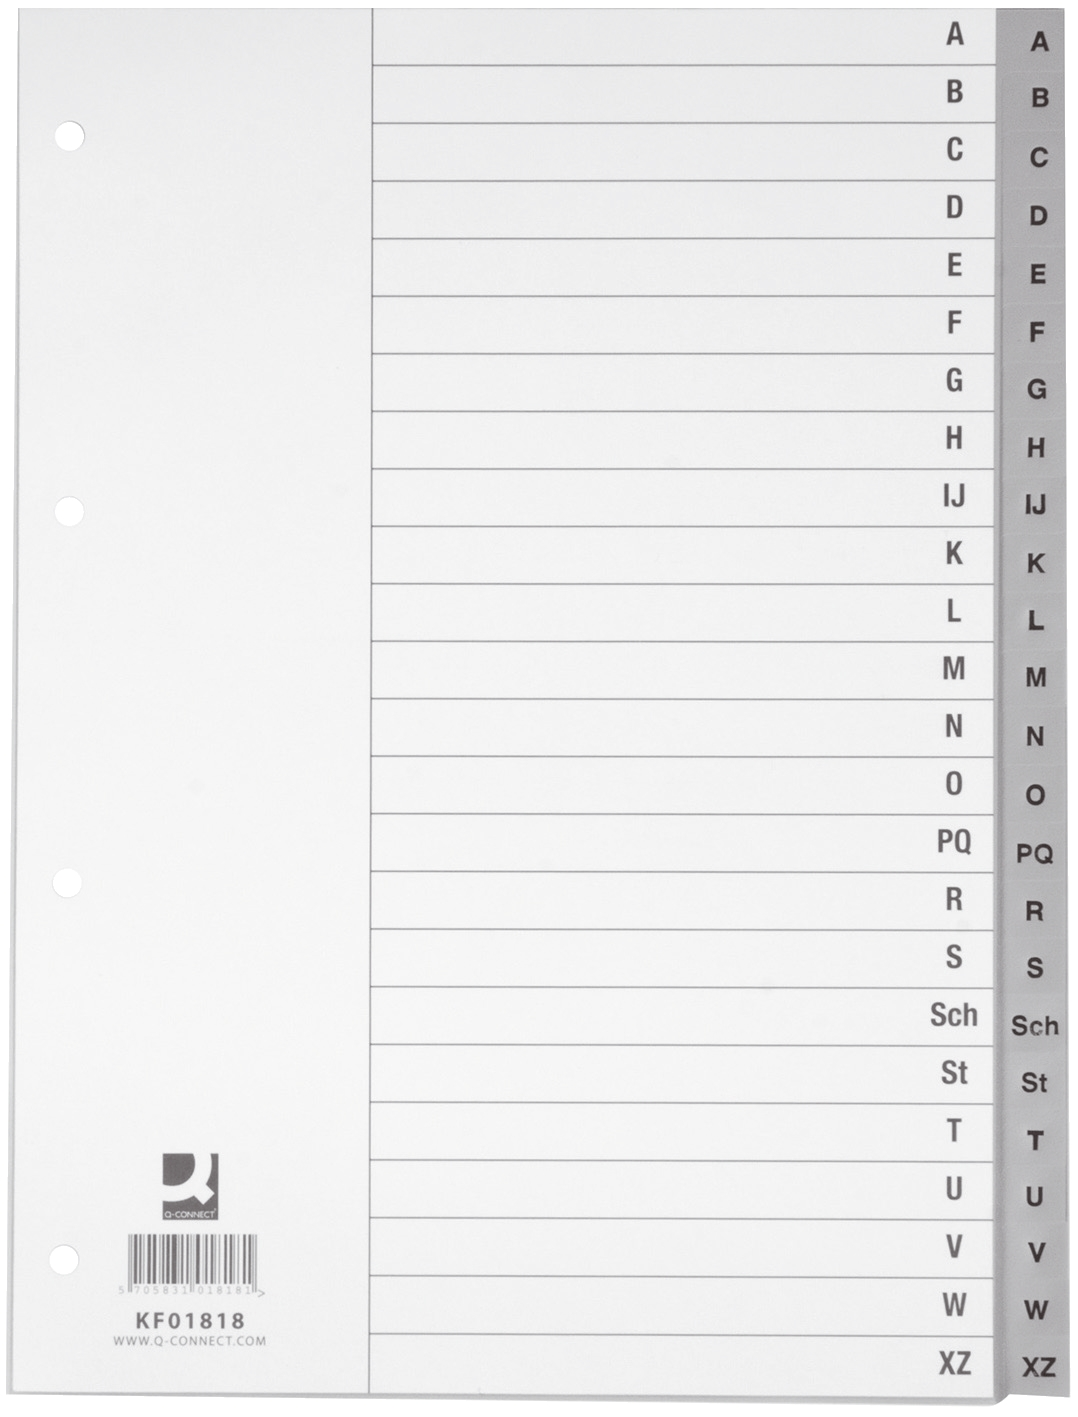 Z 24 Blatt Q-Connect Register ohne Index grau PP 21 cm hoch A4 A